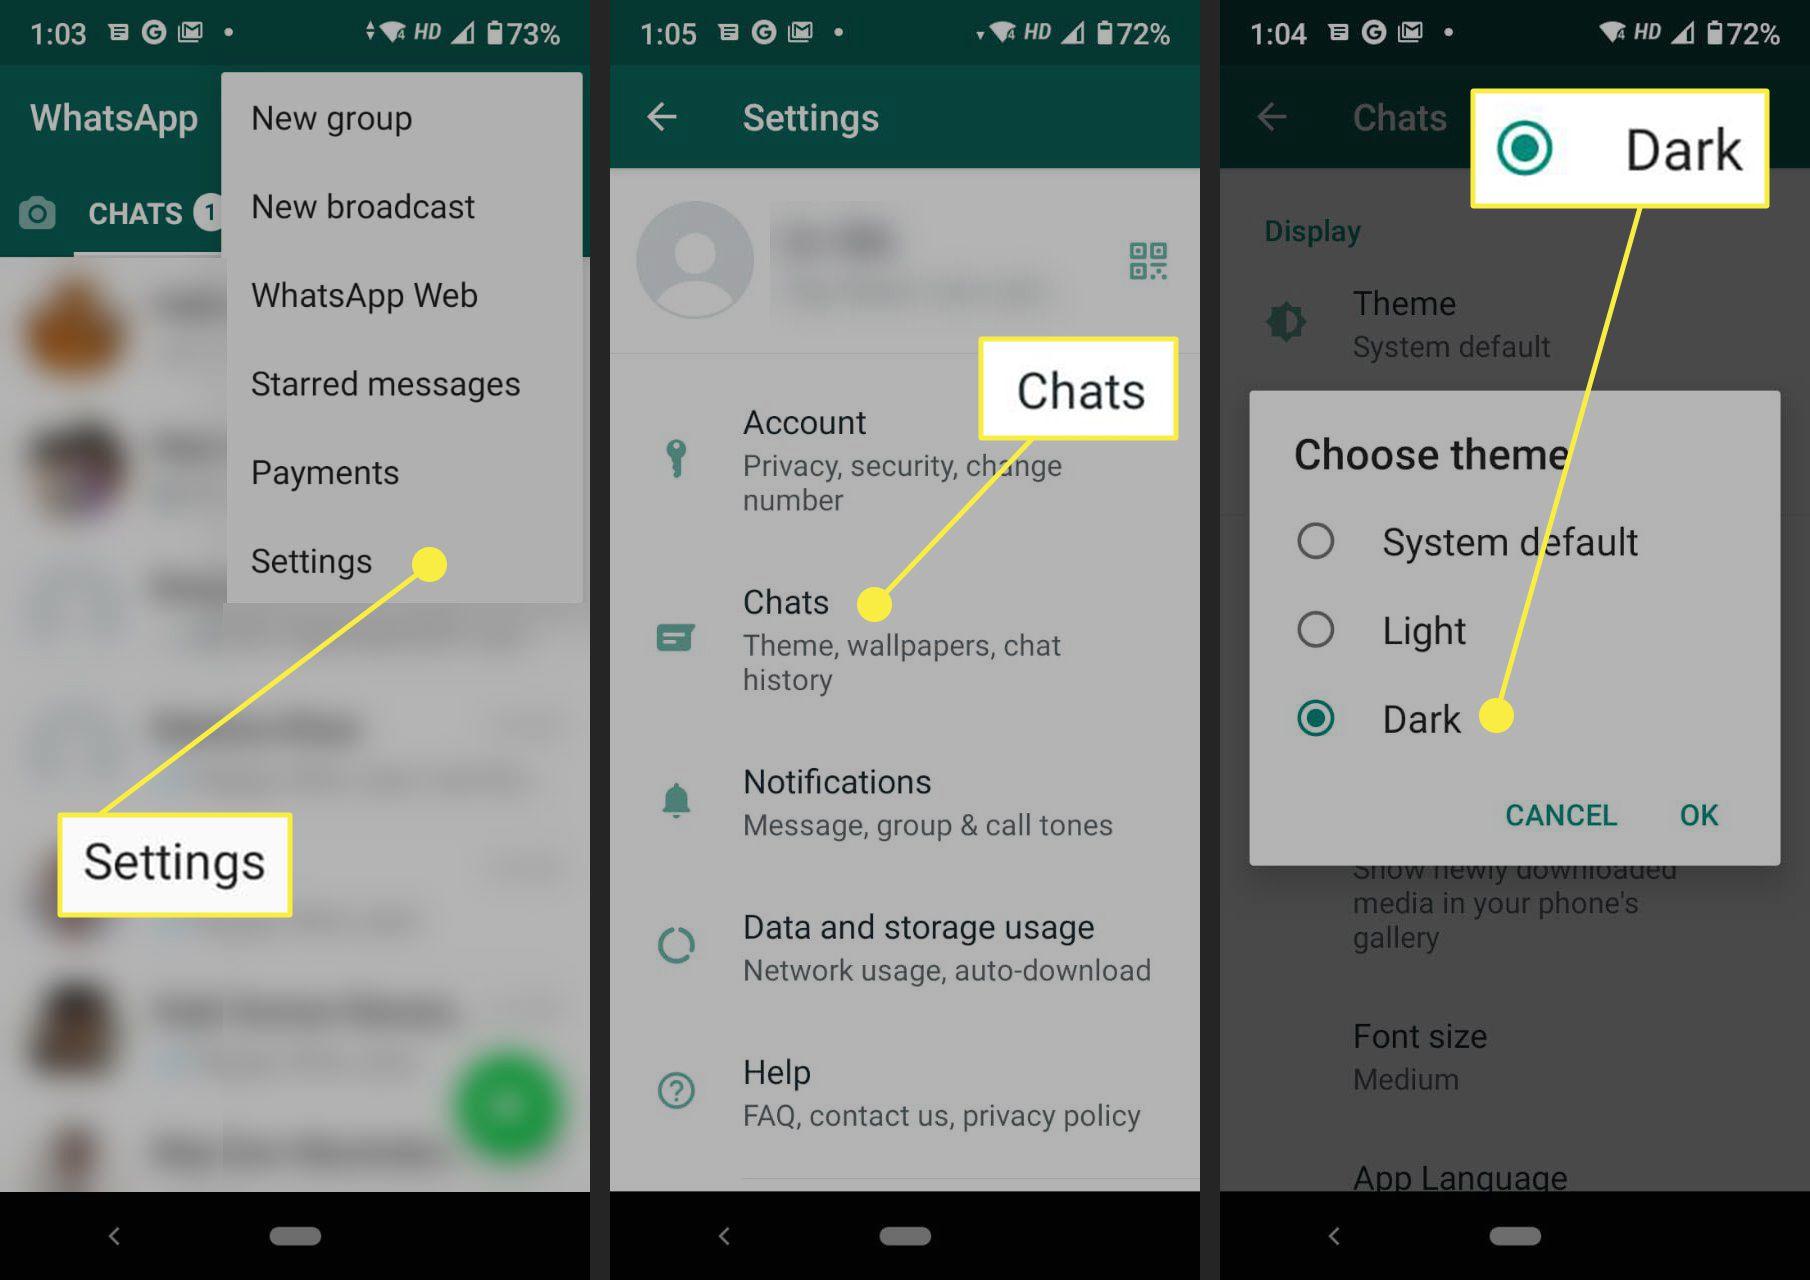 Choosing Dark theme in WhatsApp Android.